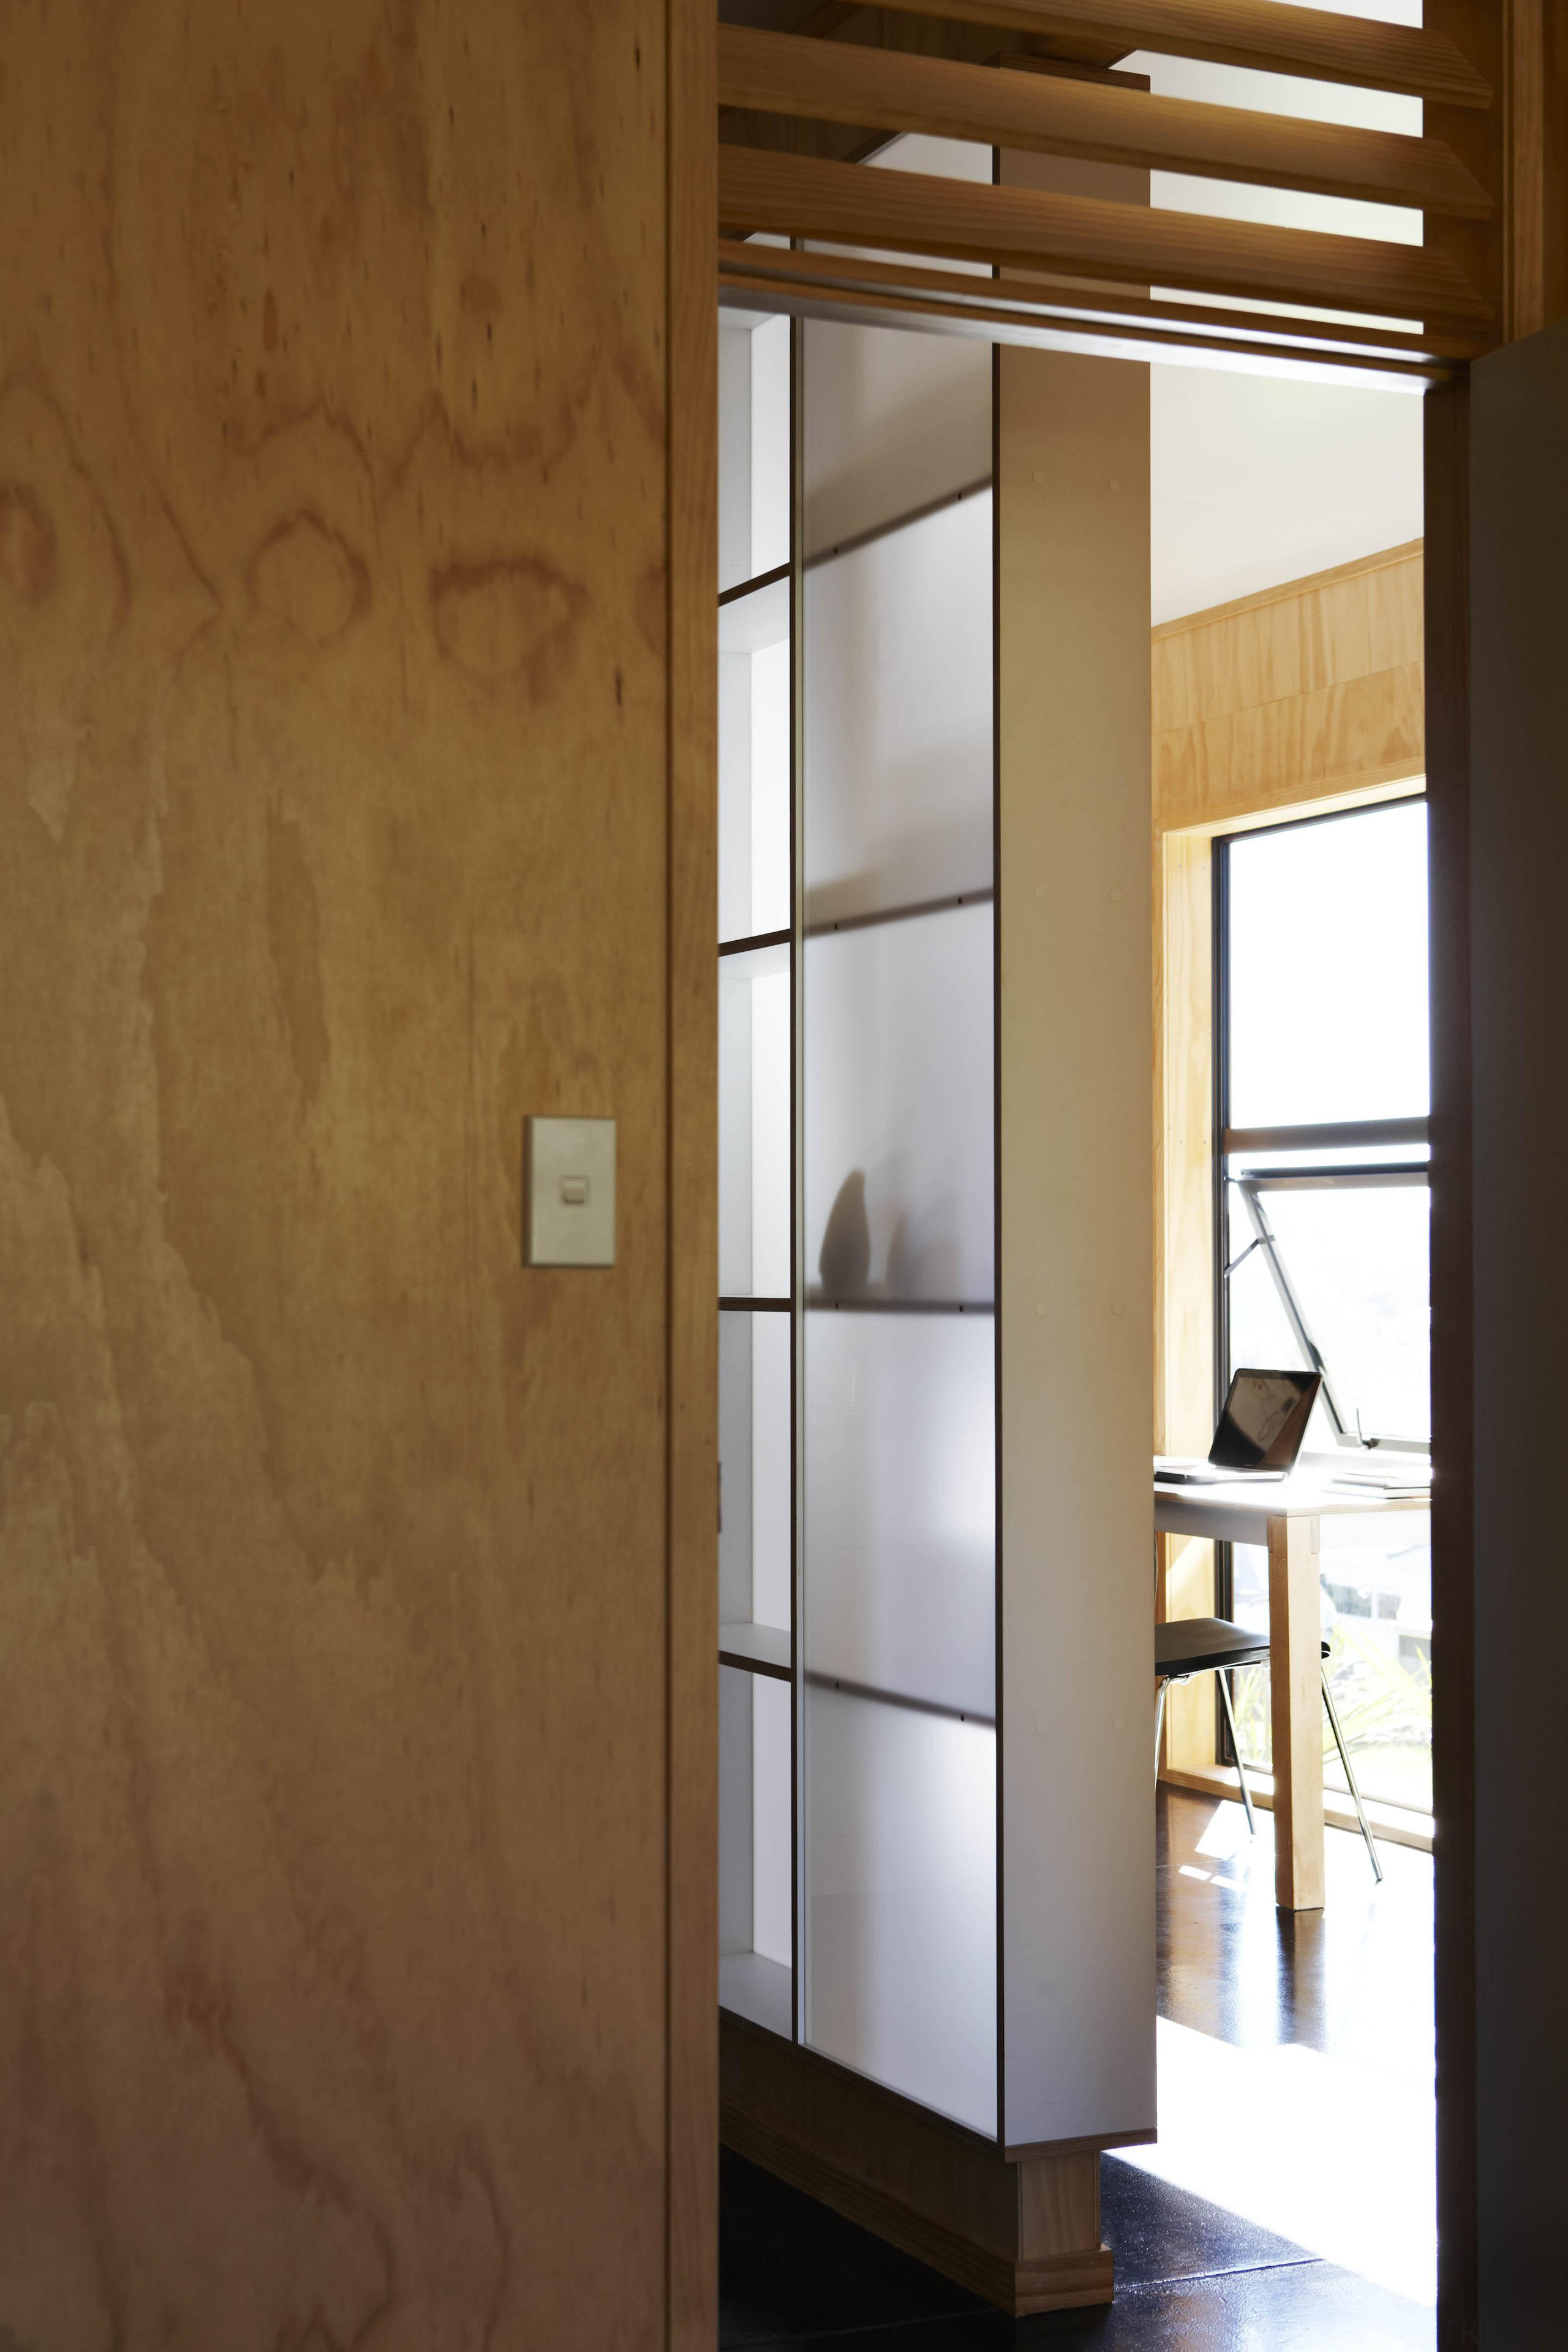 Waitakere Ranges - Studio 19 VisionWest Community Housing cabinetry, cupboard, door, furniture, shelf, shelving, wardrobe, brown